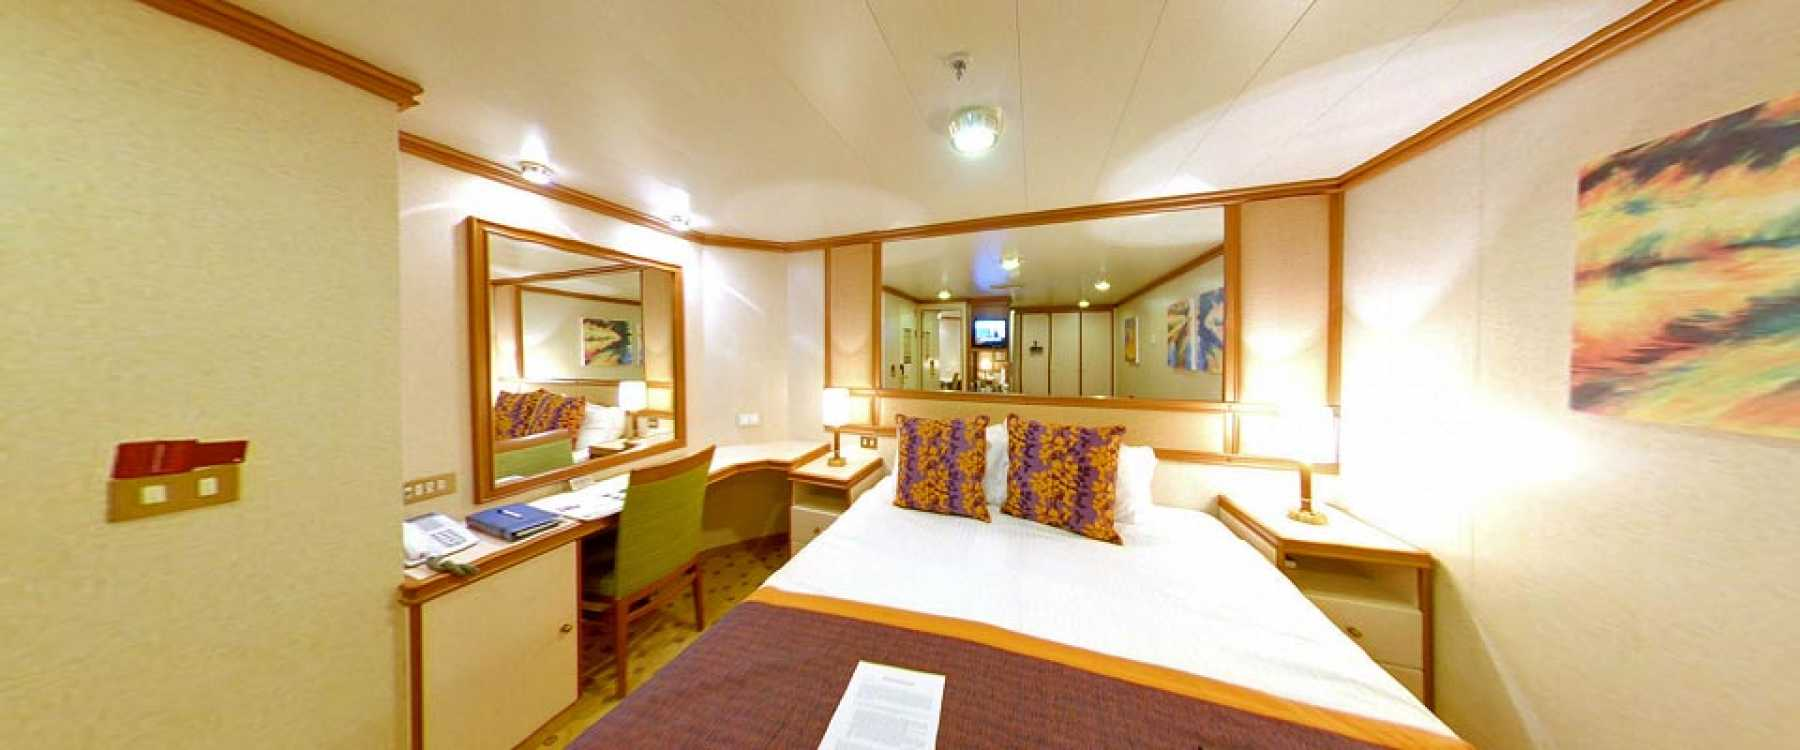 P&O Cruises Ventura Accommodation Inside Cabin.jpg